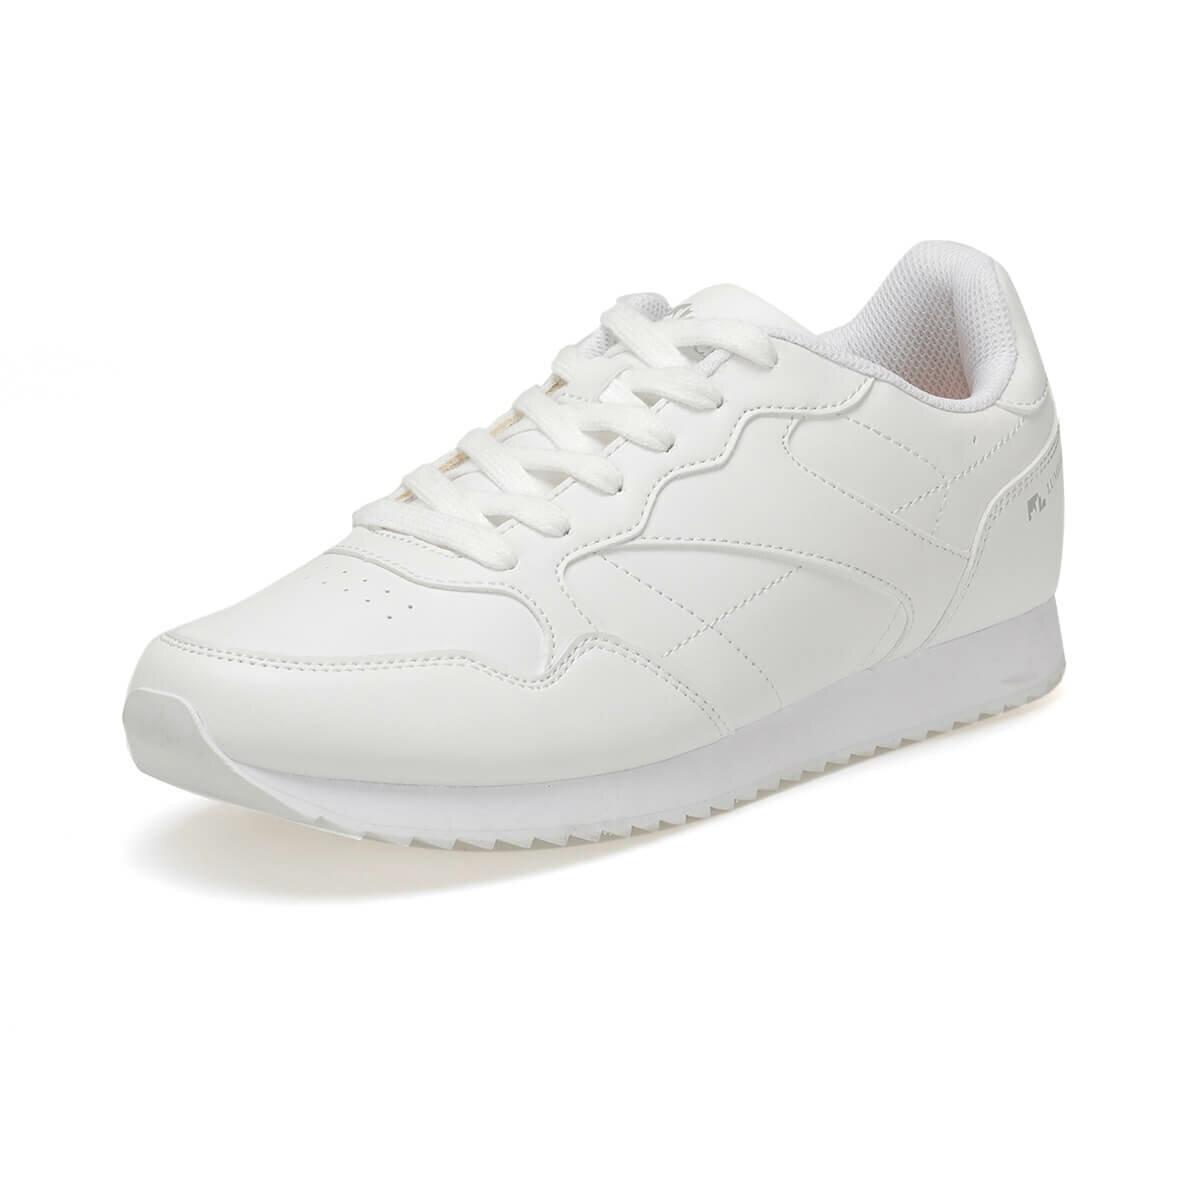 FLO RAFAEL 9PR Black Men 'S Sneaker Shoes LUMBERJACK